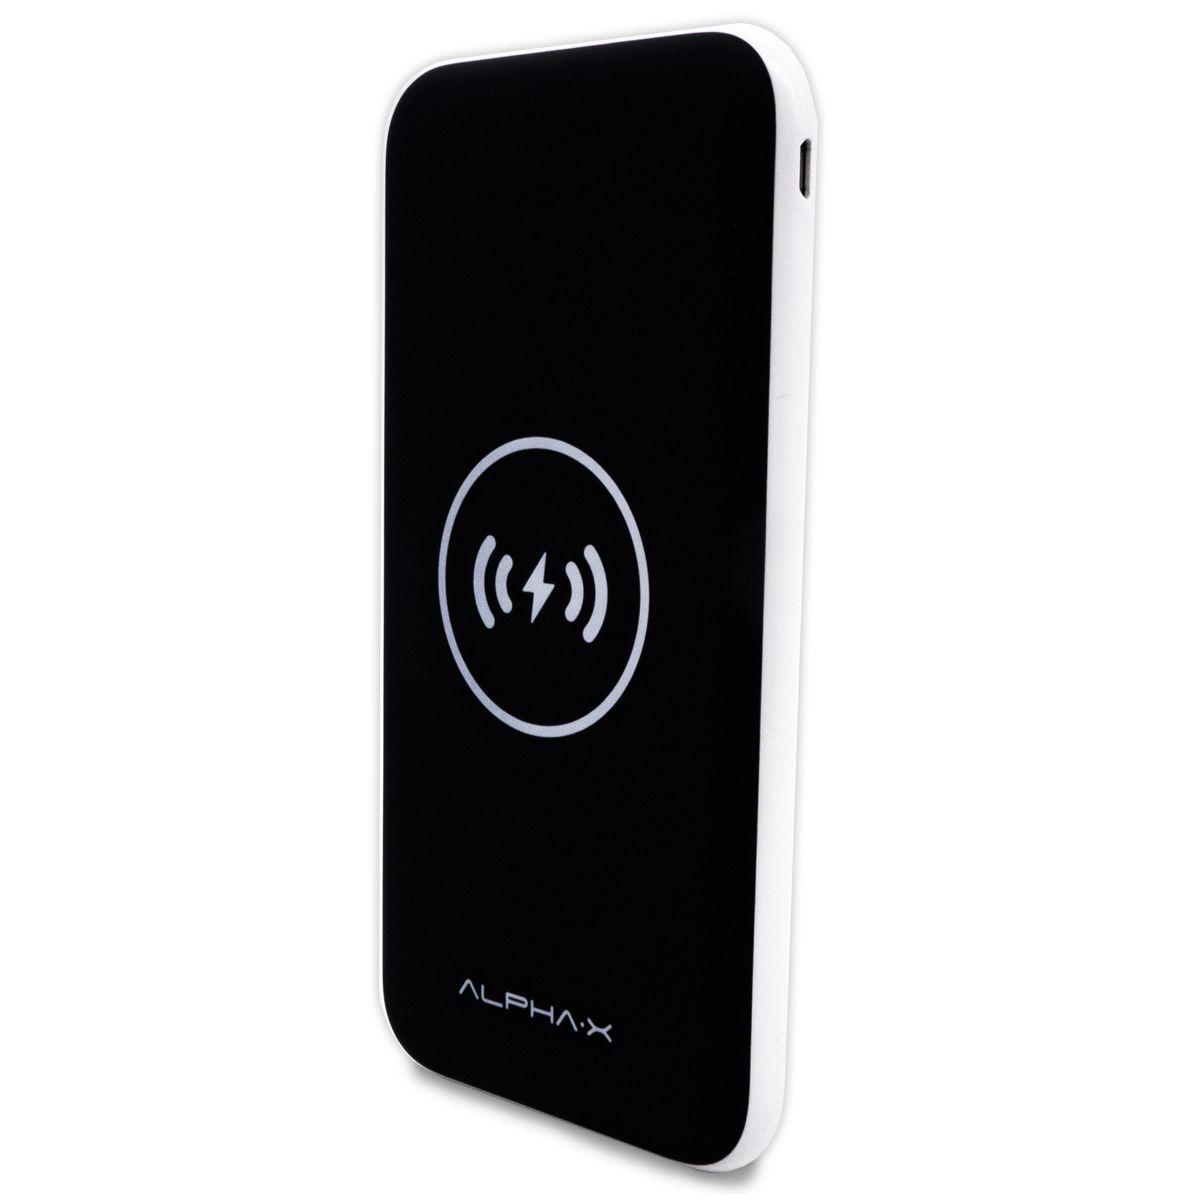 Carregador Portátil Wireless Power Bank Alpha-X 10000mAh - W10